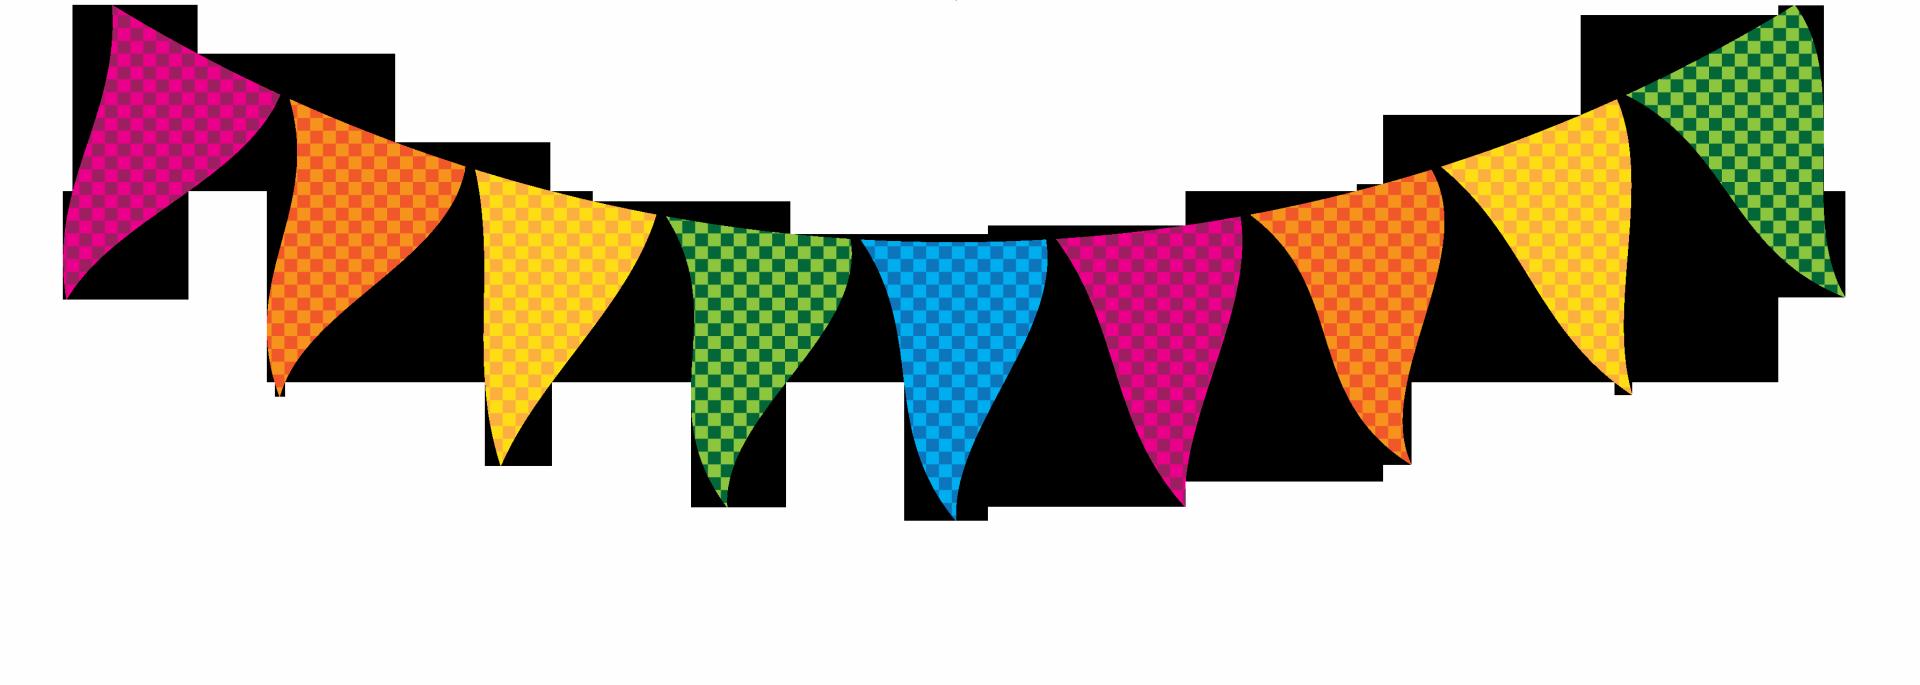 ... Birthday Banner Clipart 6 ...-... Birthday banner clipart 6 ...-4